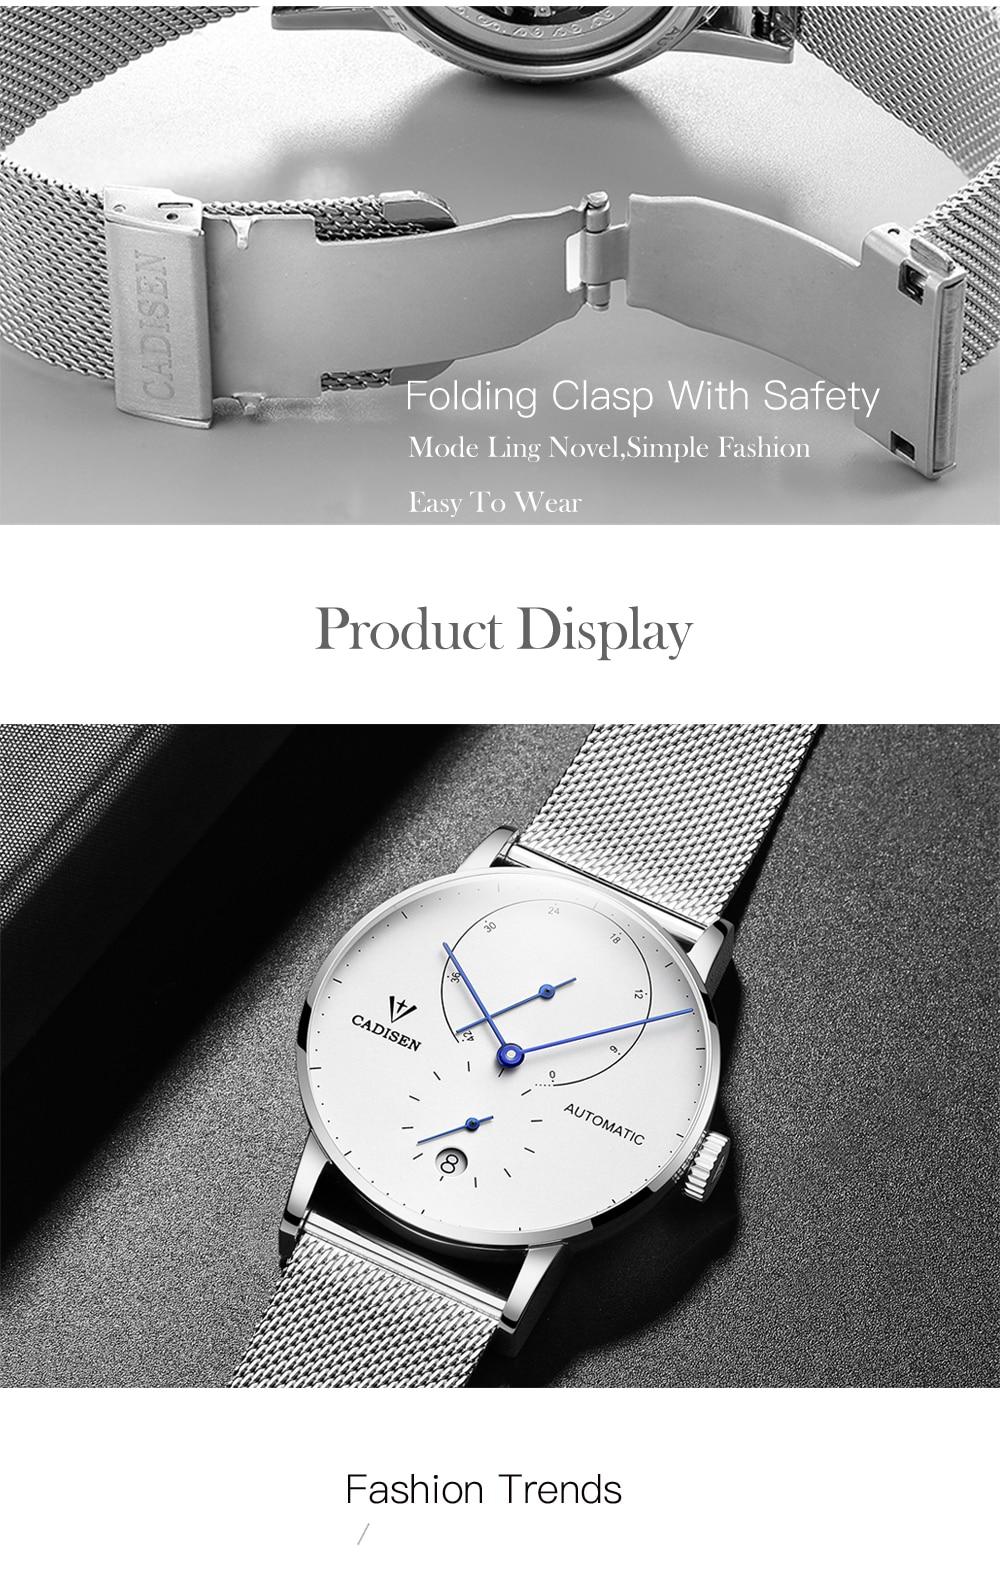 HTB1w.D D3mTBuNjy1Xbq6yMrVXac CADISEN Top Mens Watches Top Brand Luxury Automatic Mechanical Watch Men Full Steel Business Waterproof Fashion Sport Watches